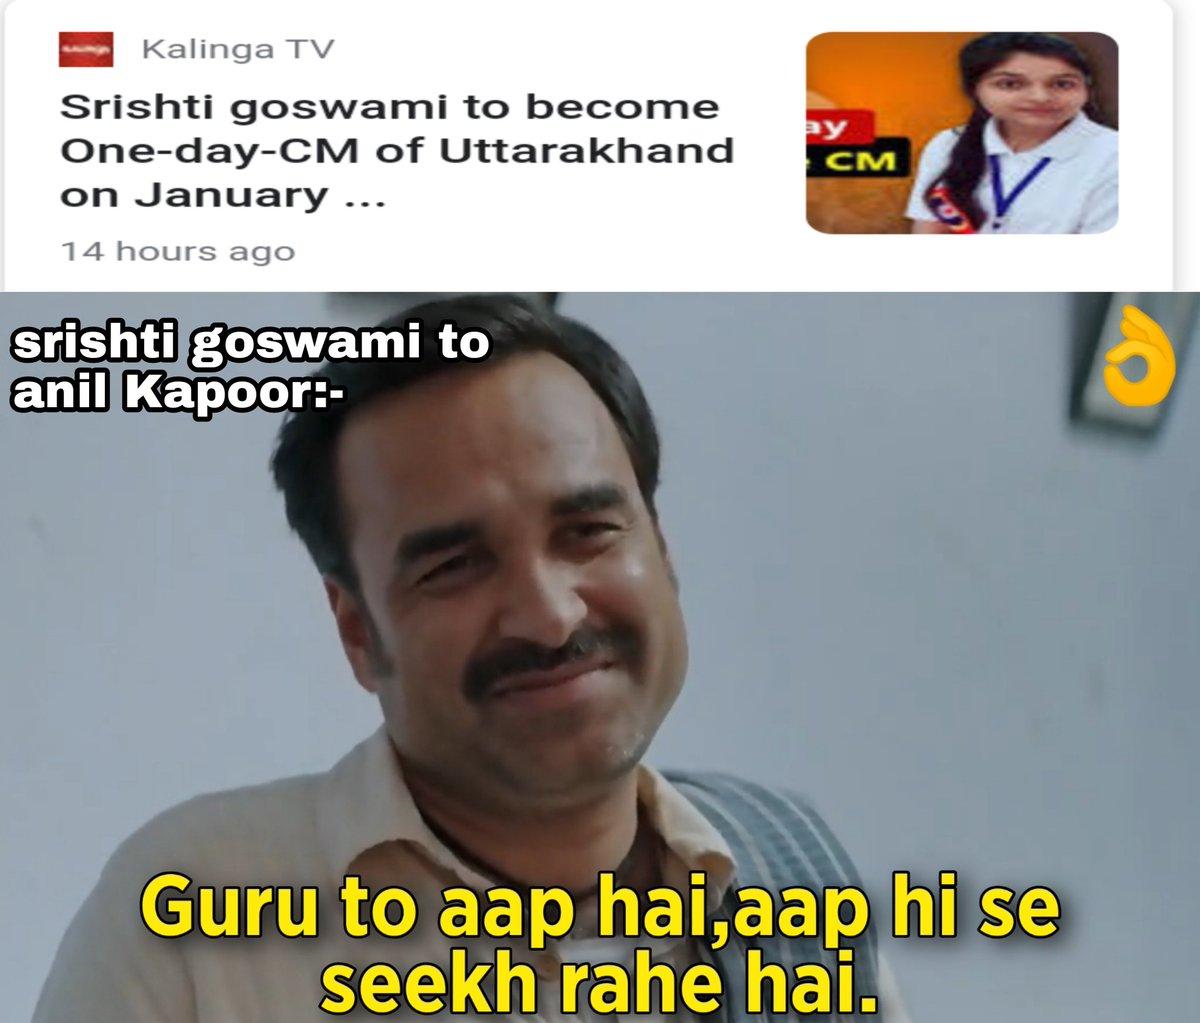 #SrishtiGoswami #news #anilkapoor #nayak